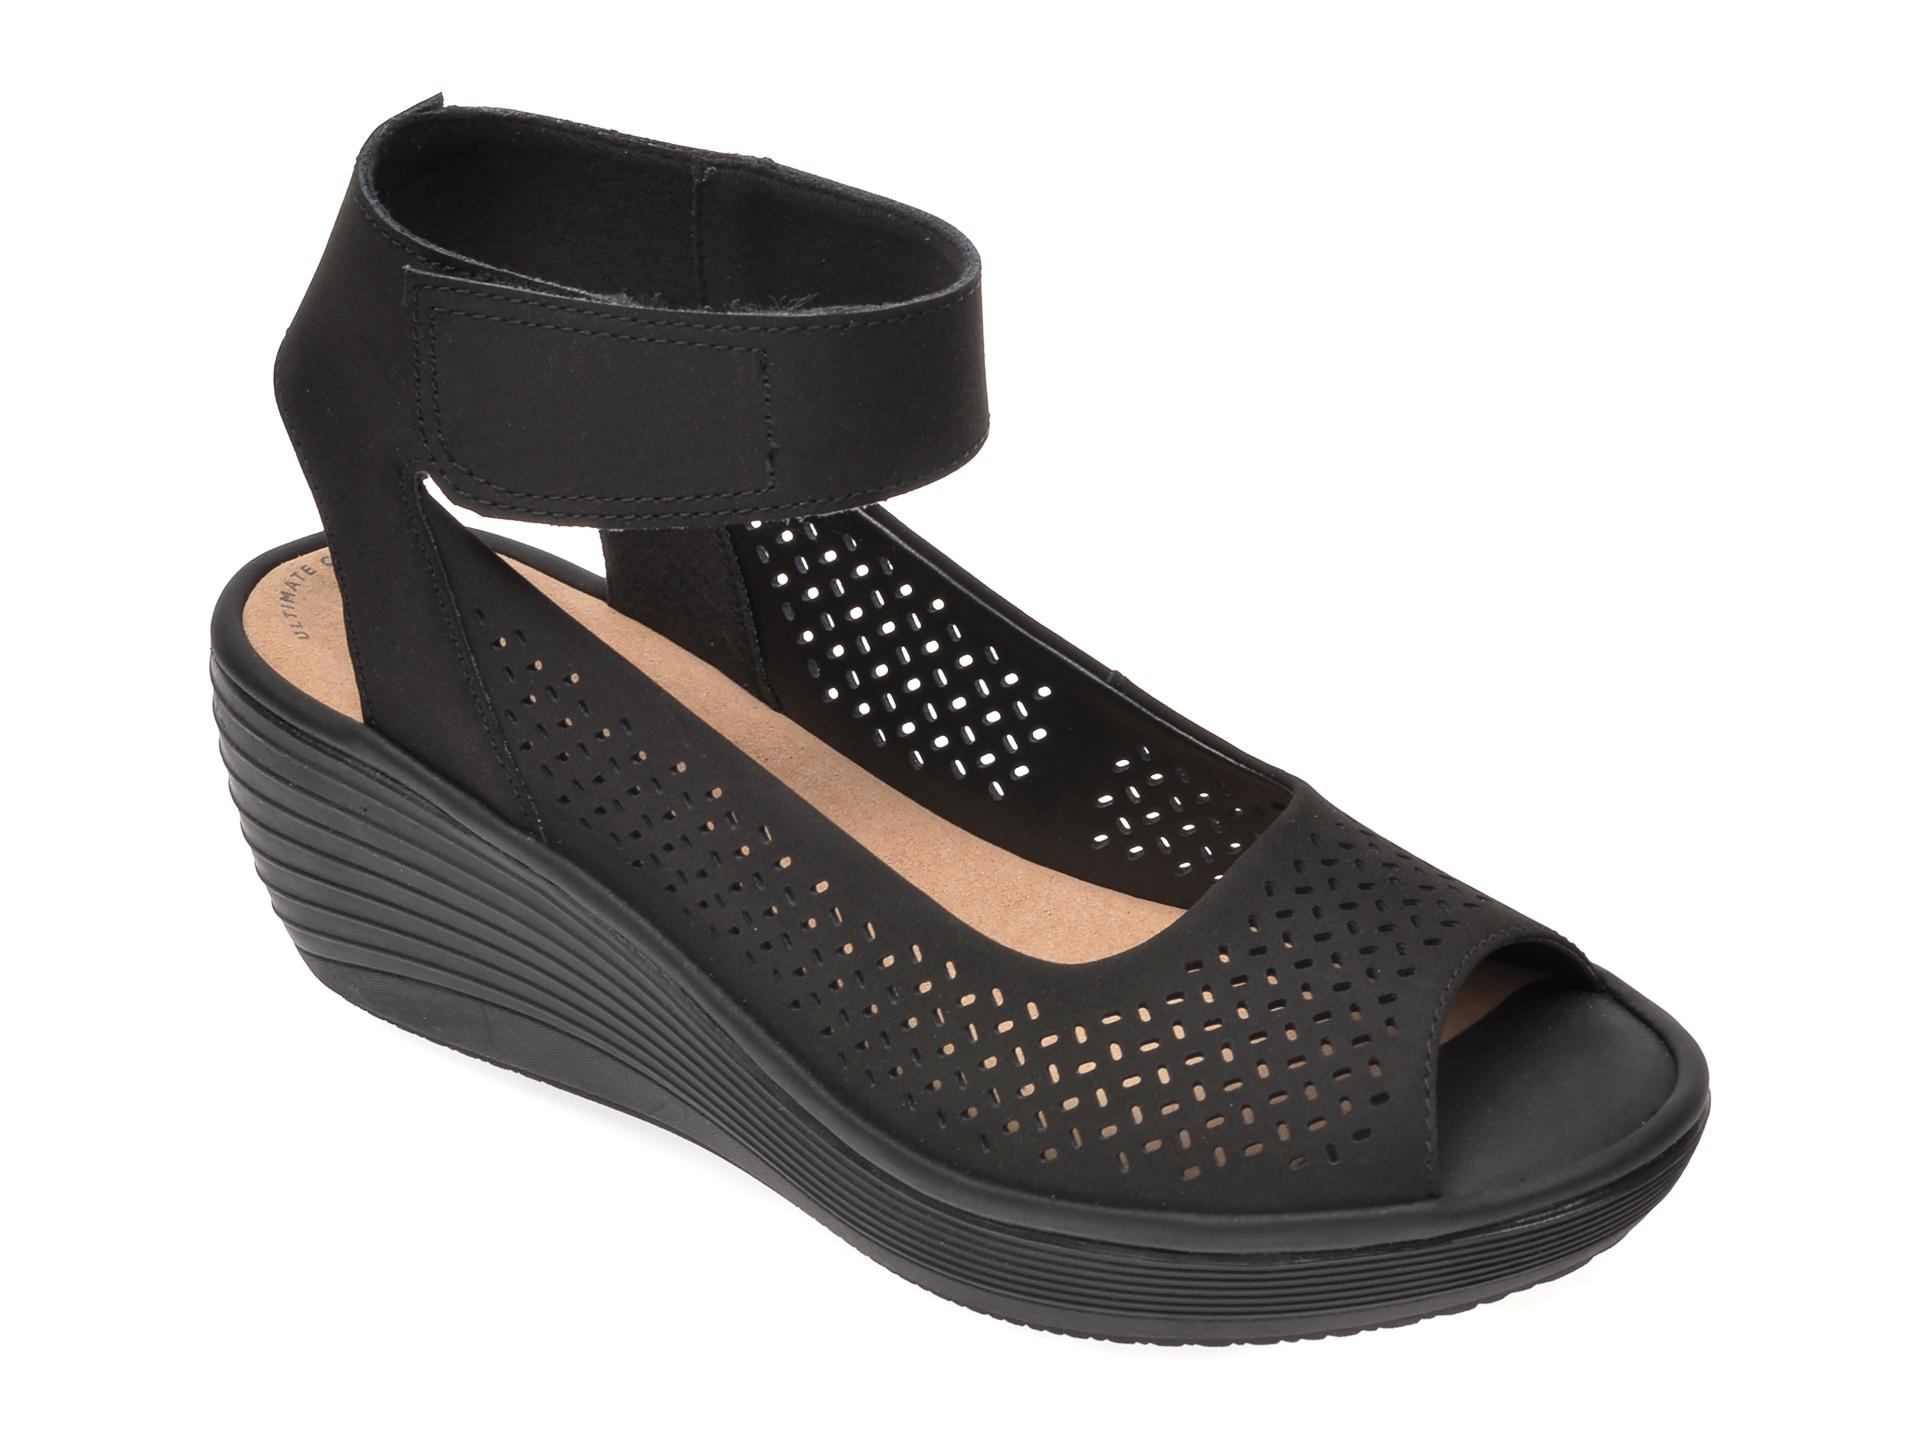 Sandale CLARKS negre, Reedly Jump, din nabuc